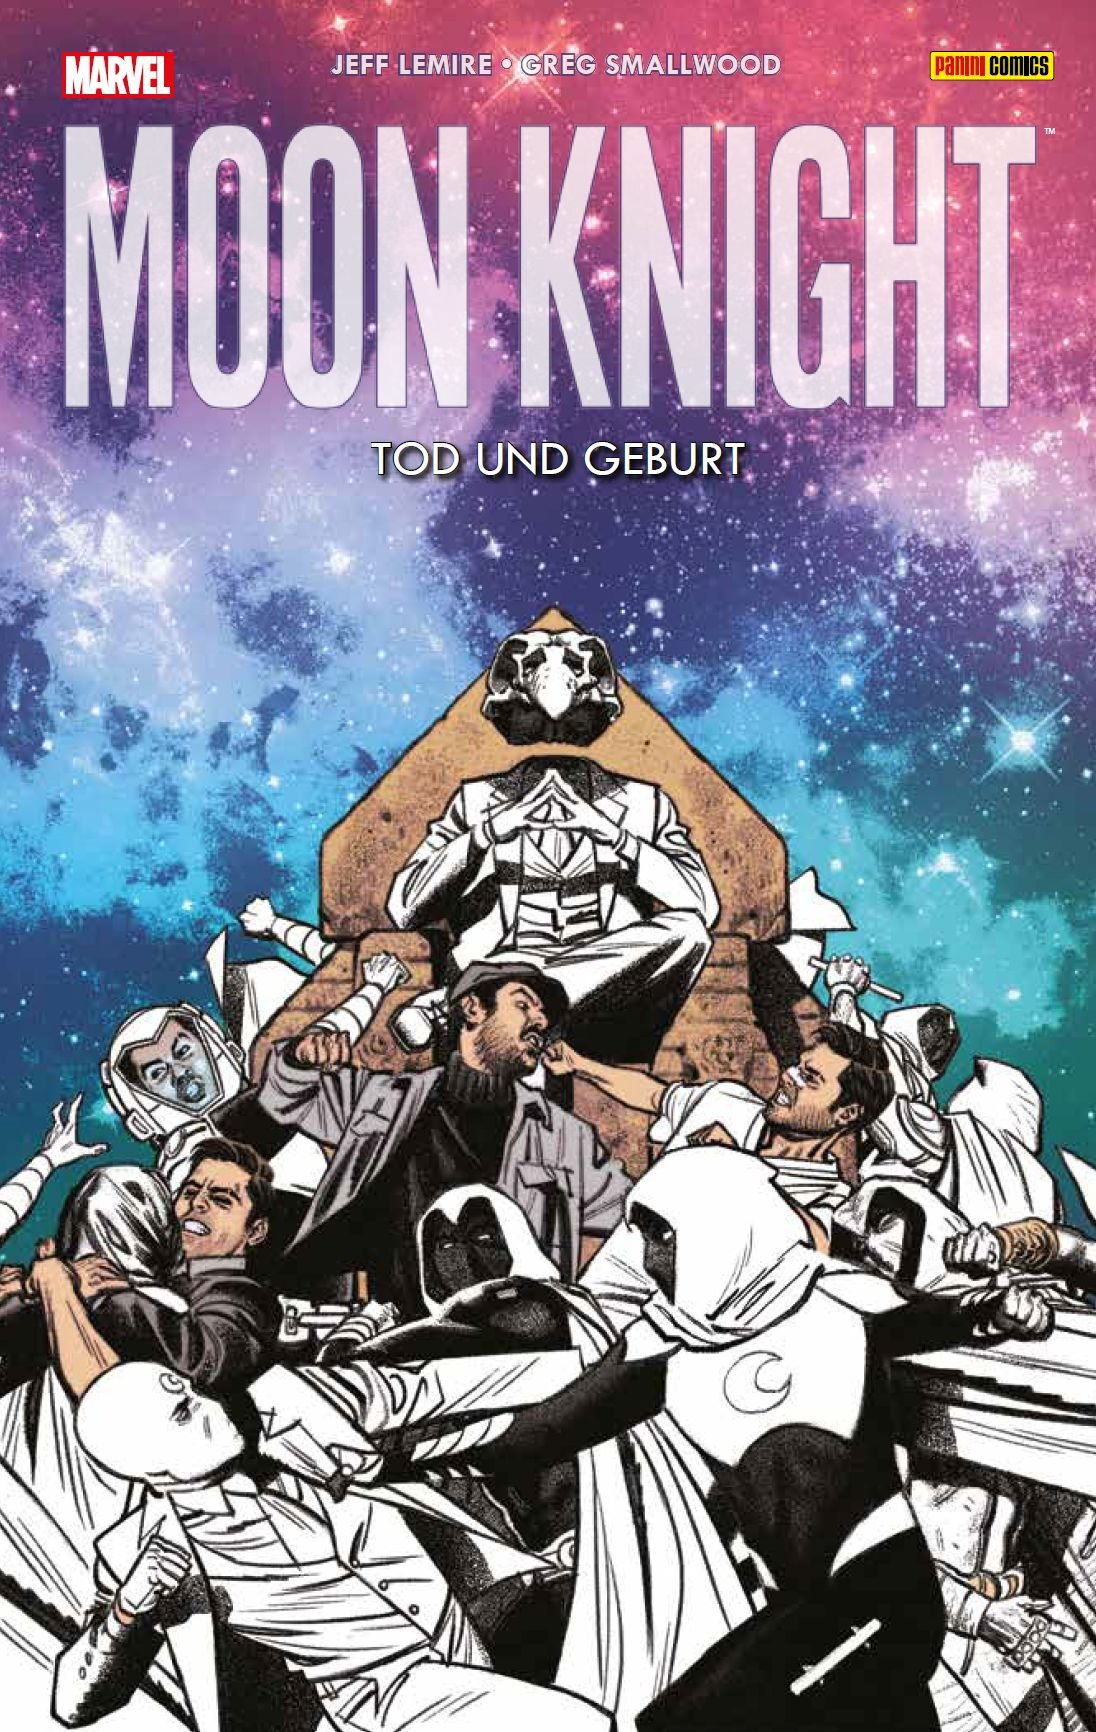 Moon Knight: Bd. 3 (2. Serie): Tod und Geburt Taschenbuch – 9. Januar 2018 Jeff Lemire Greg Smallwood Bernd Kronsbein Panini